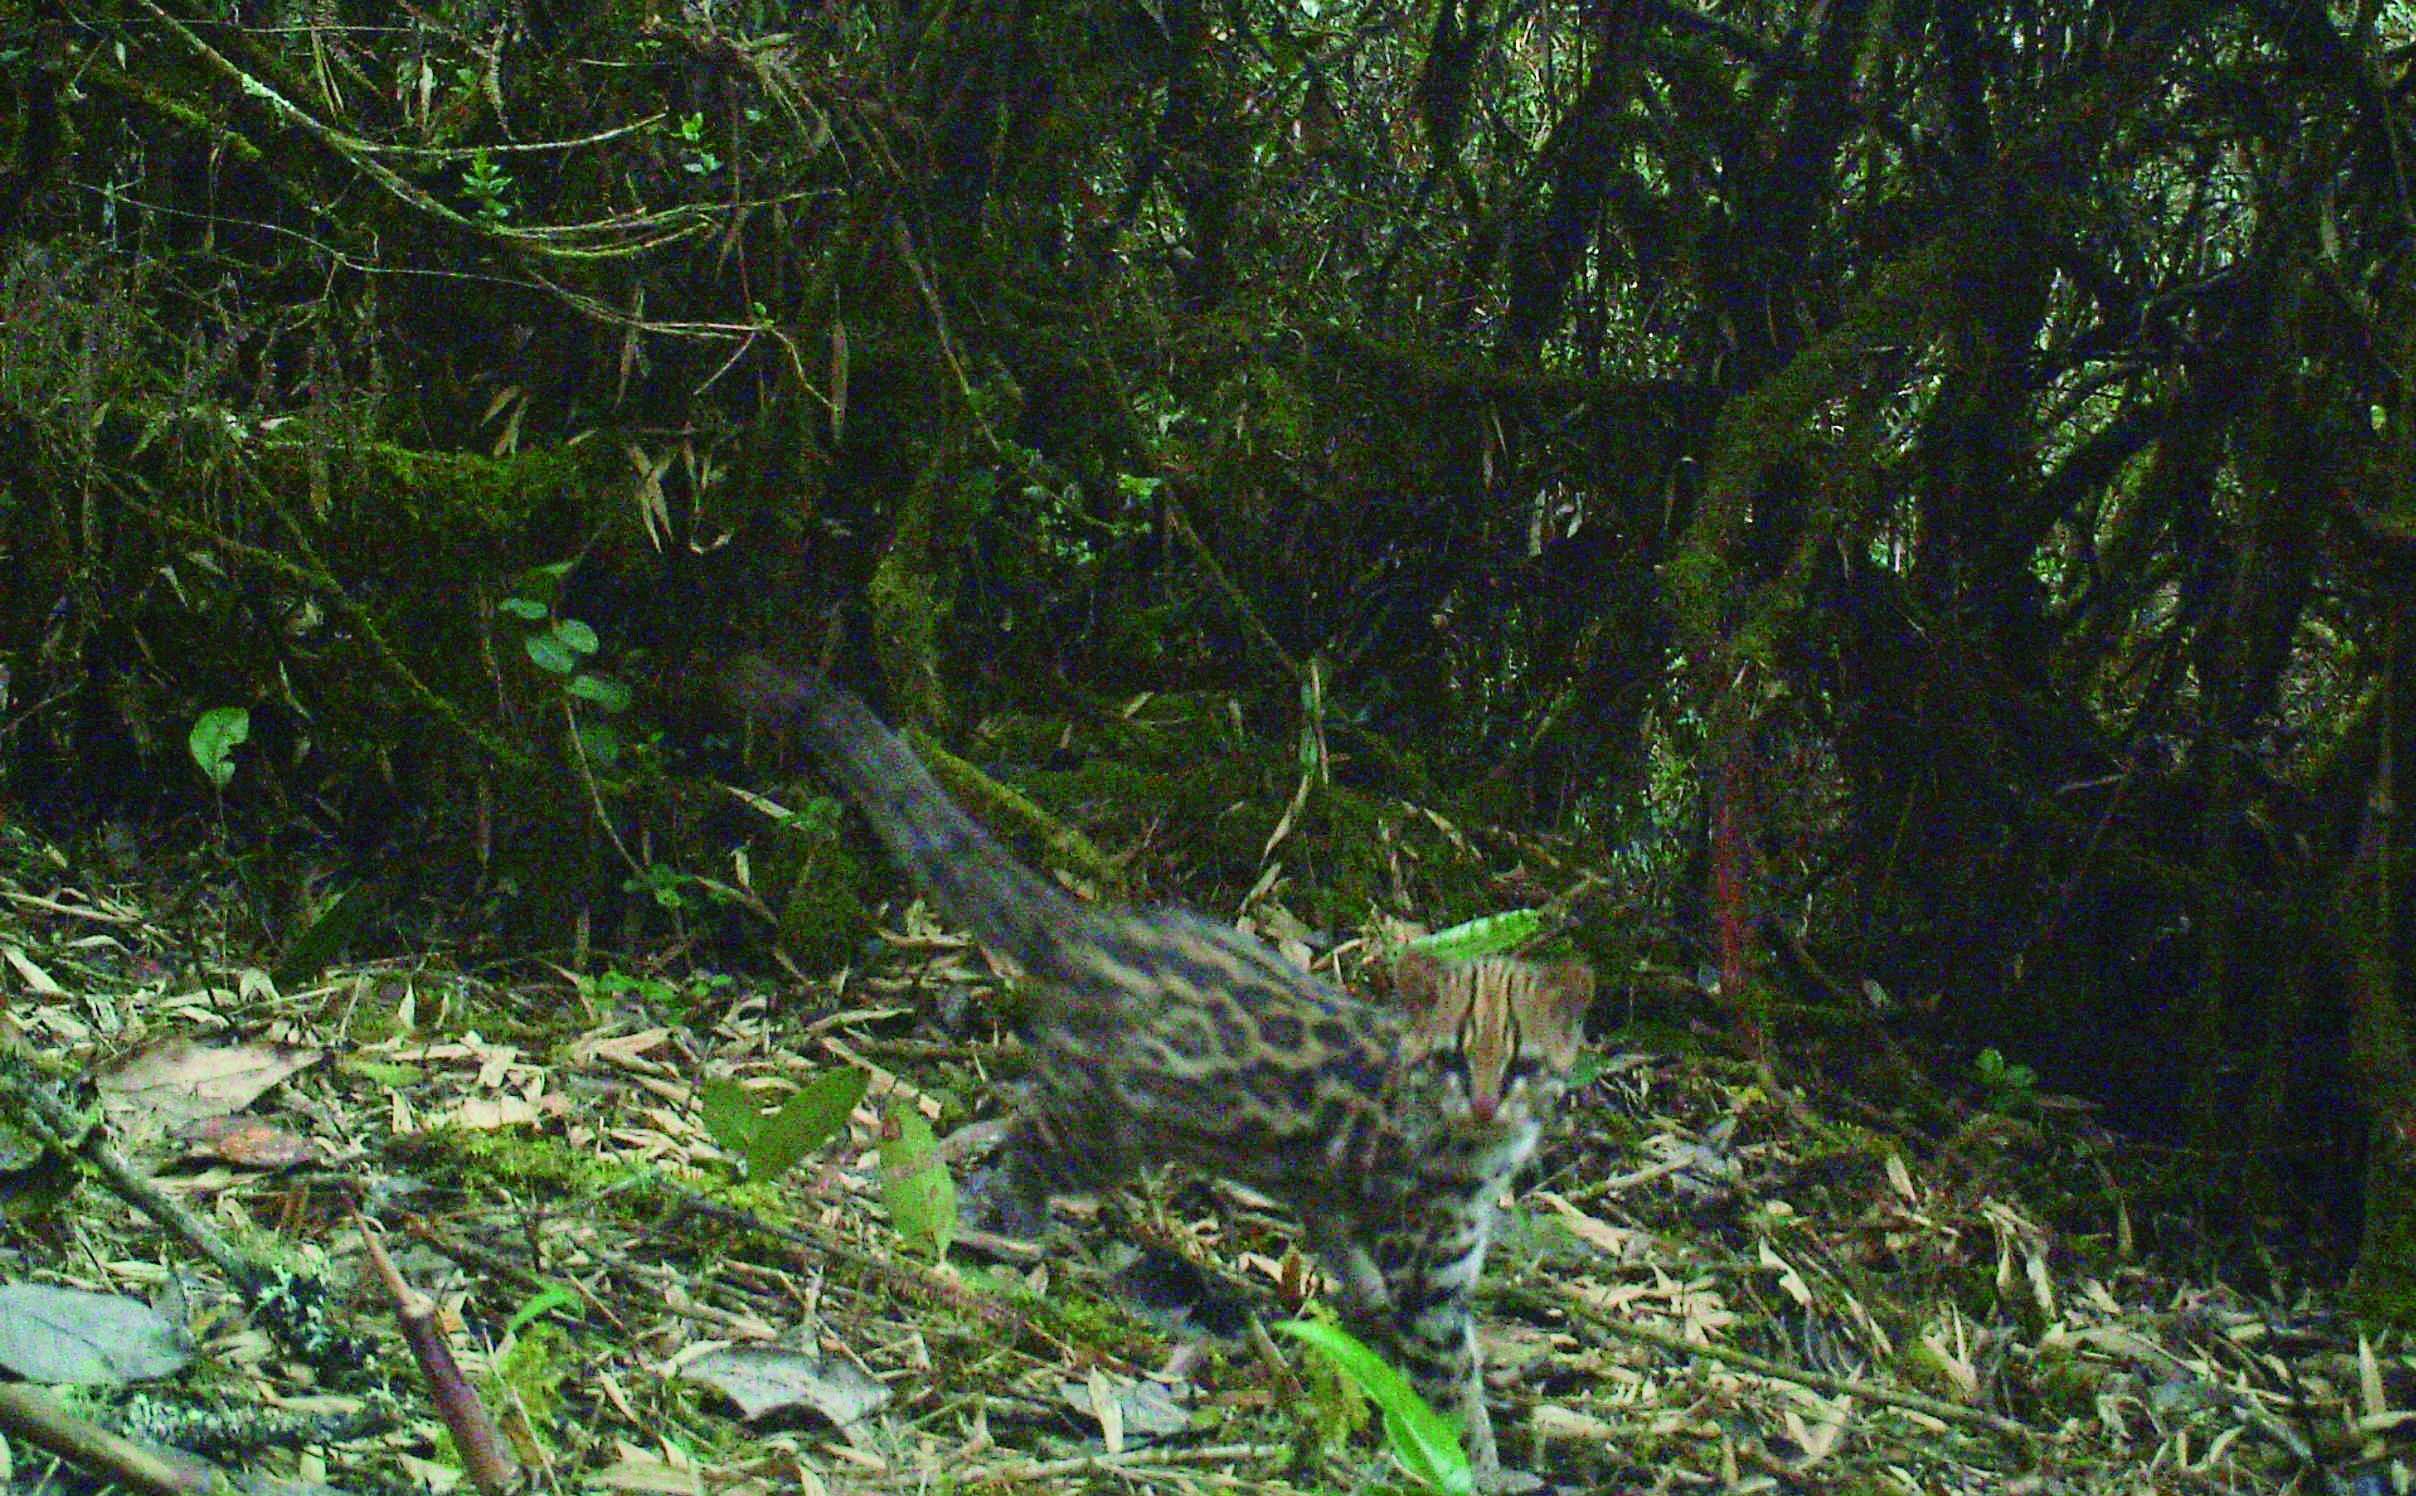 Tigrillo lanudo, Leopardus tigrinus